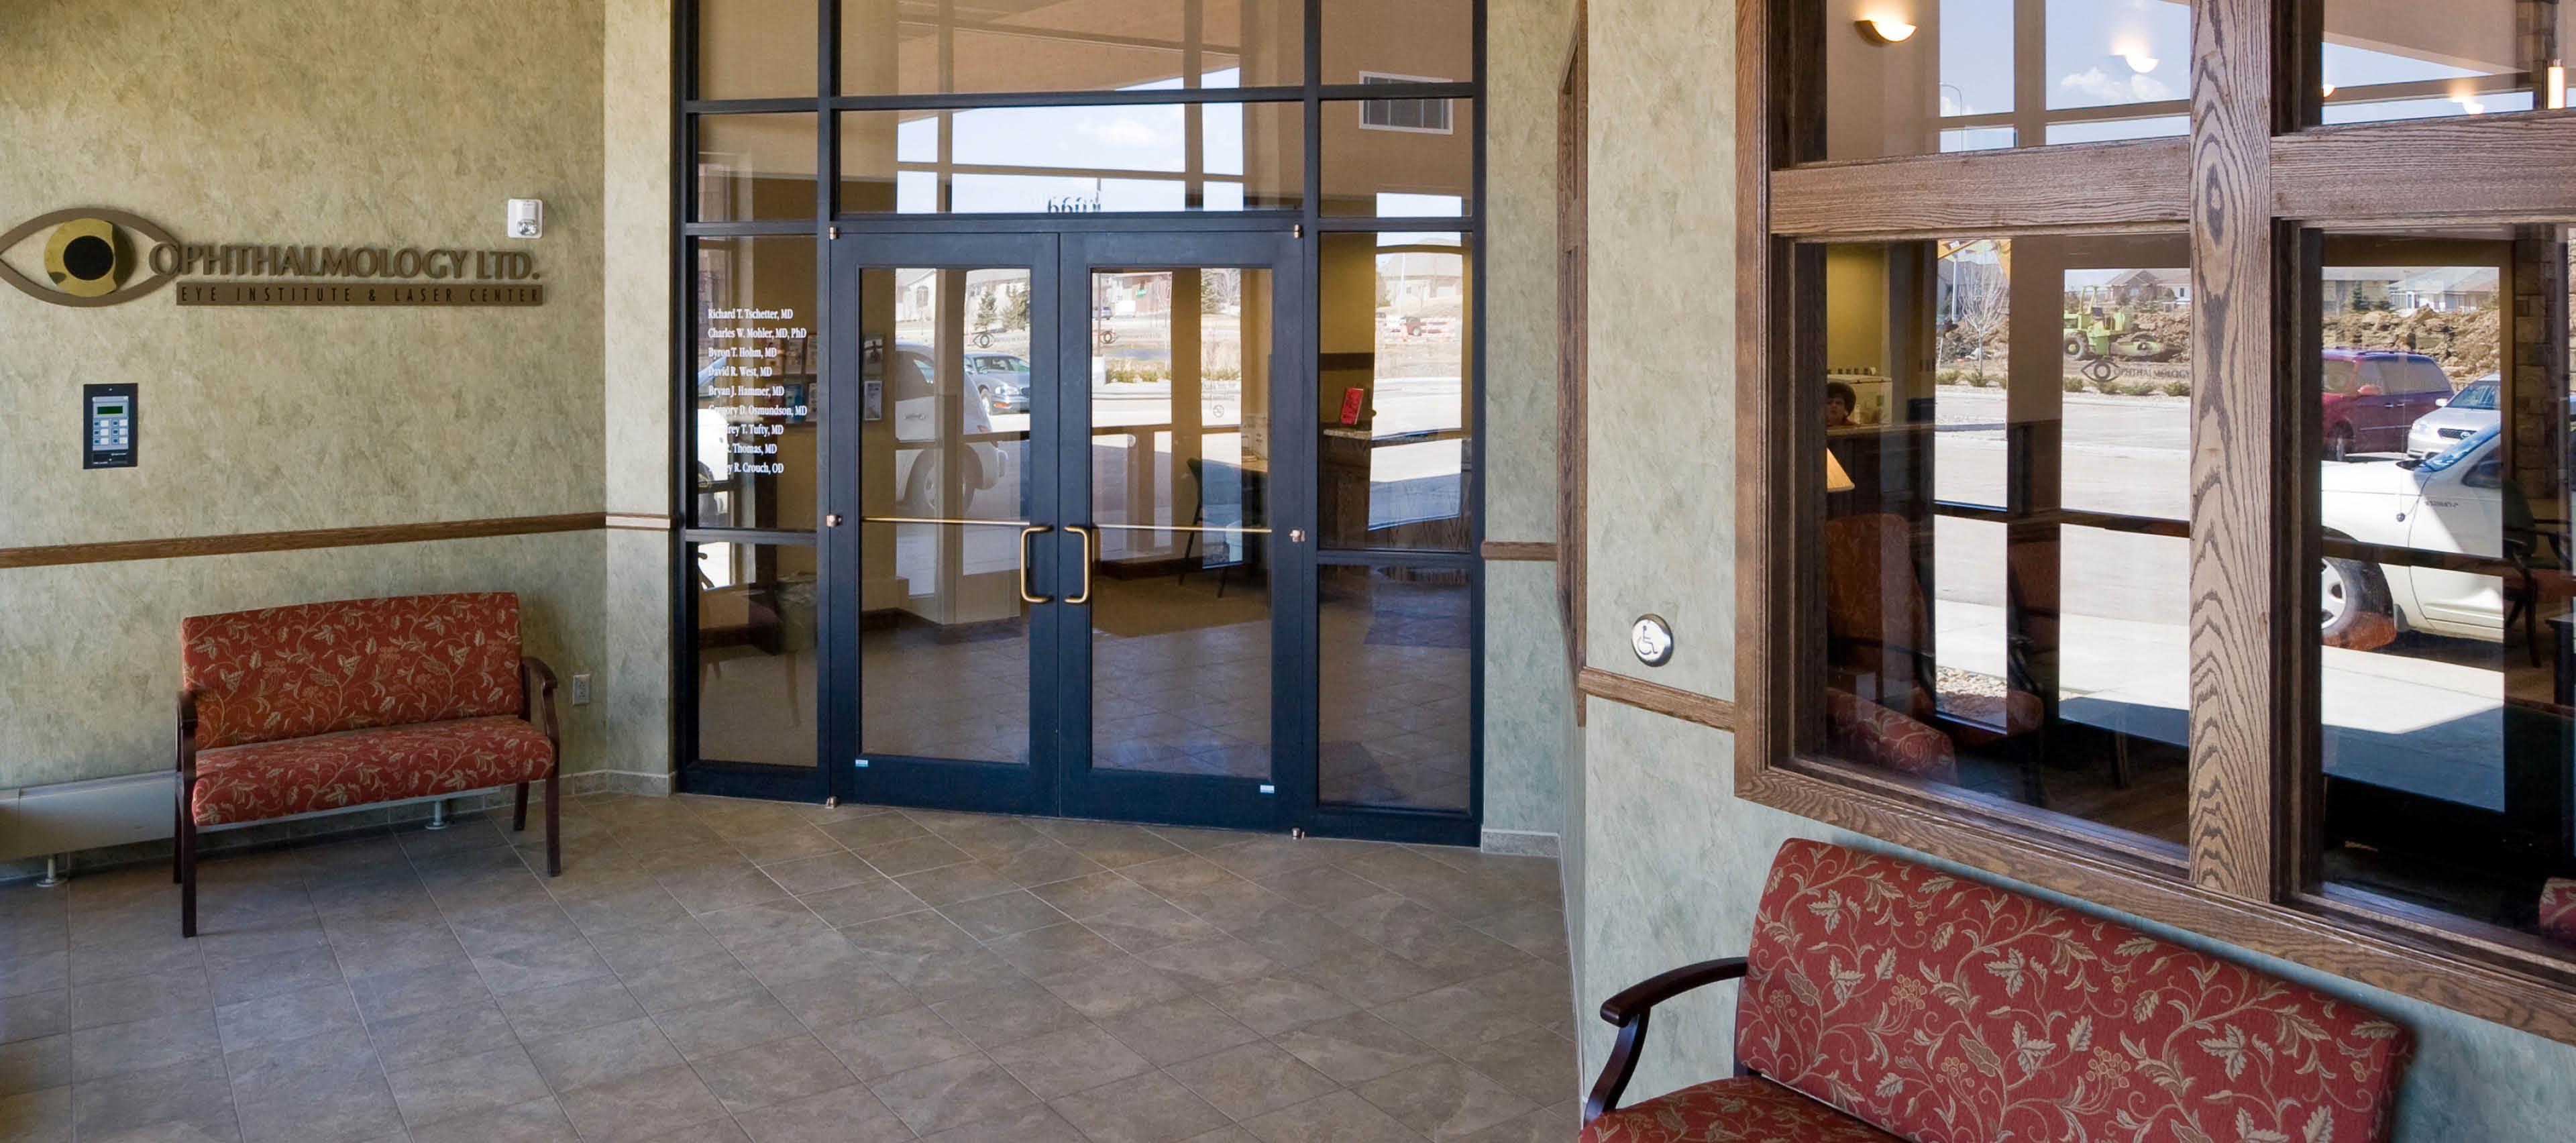 Ophthalmology Entrance